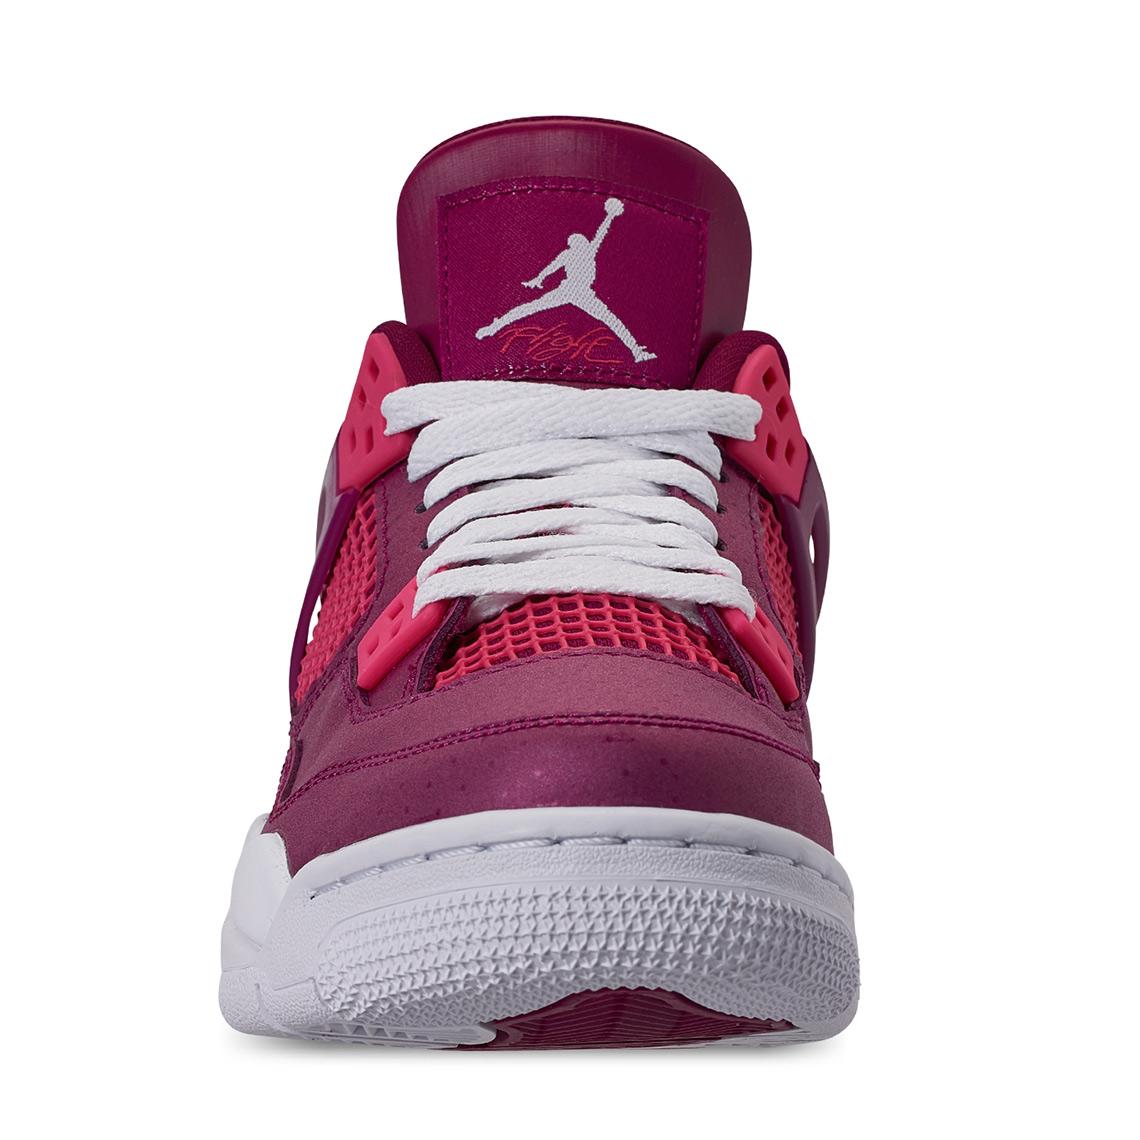 972fe077e524bd Air Jordan 4 For Love Of The Game Release Info